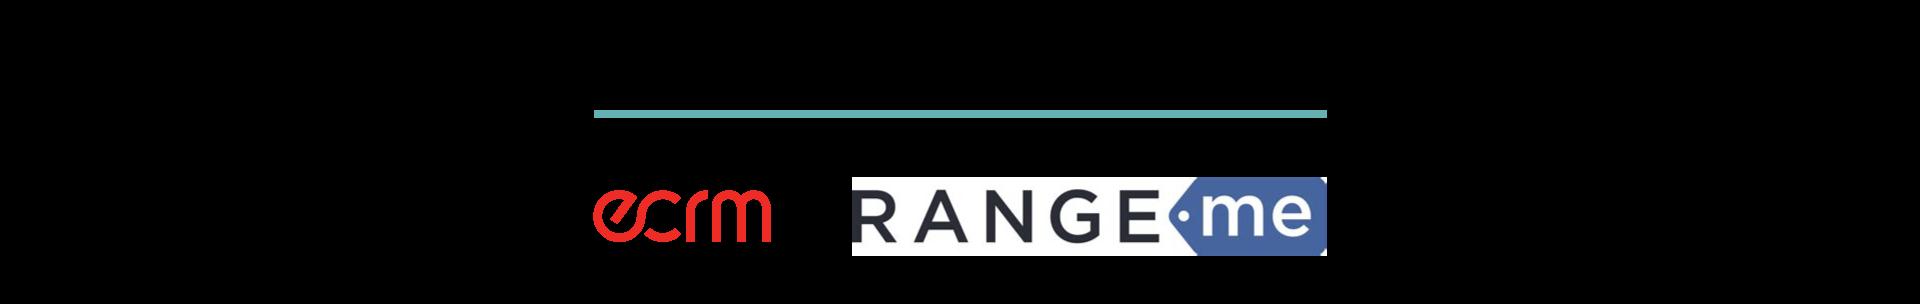 E4_1 logos of organizations